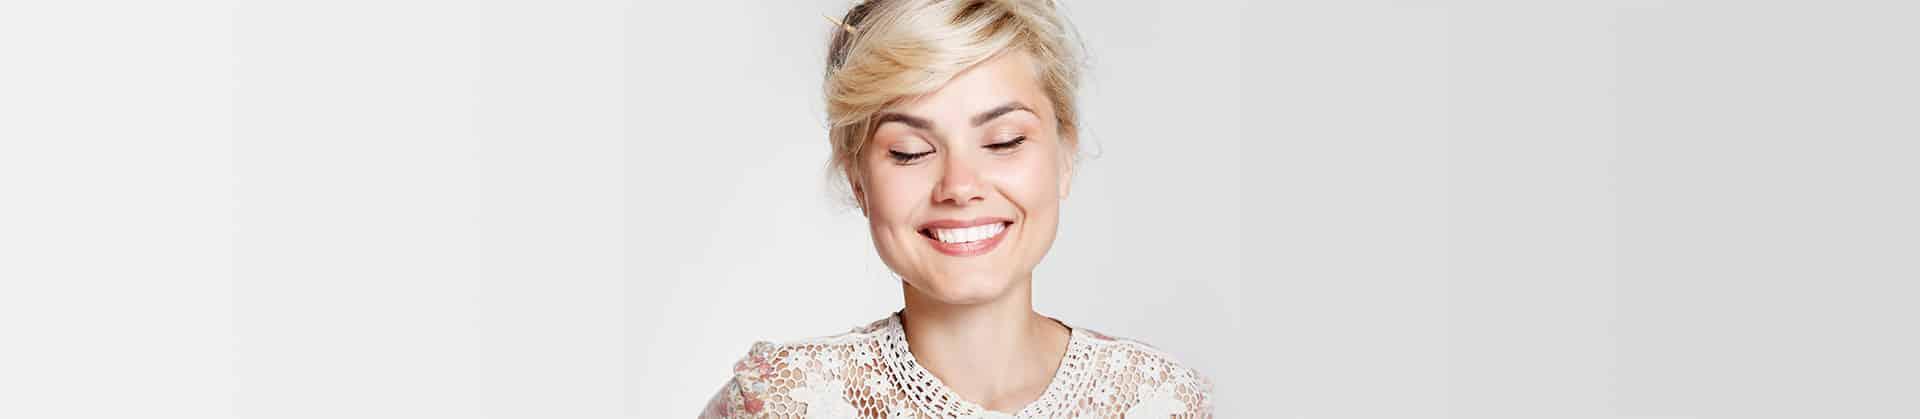 Blonde woman smilling after gummy smile treatrment Marietta, GA.